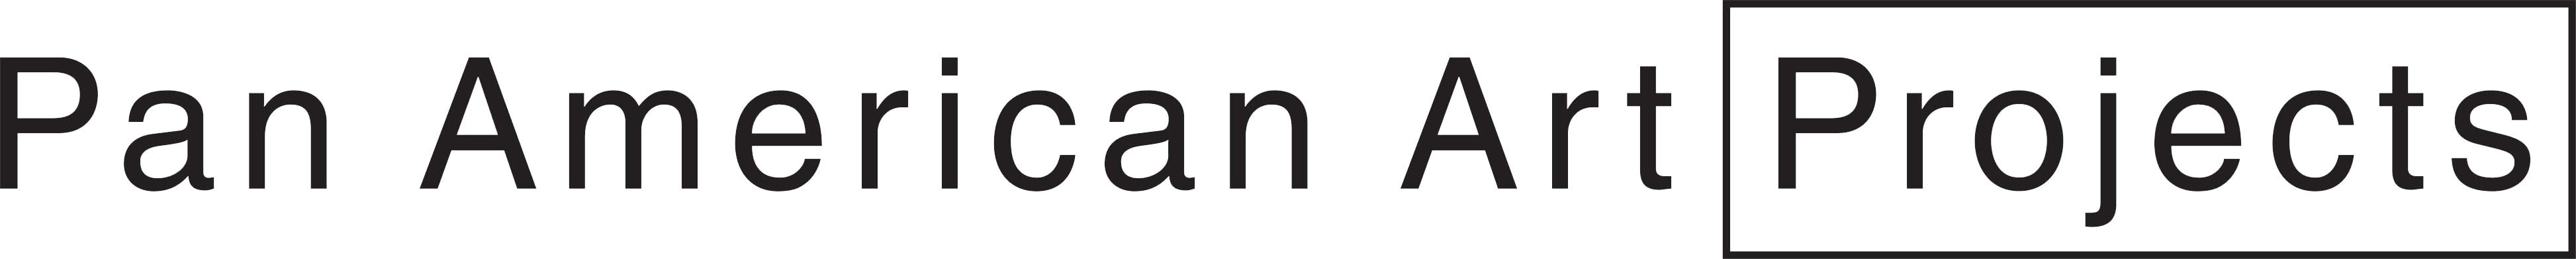 Pan American Art Projects company logo